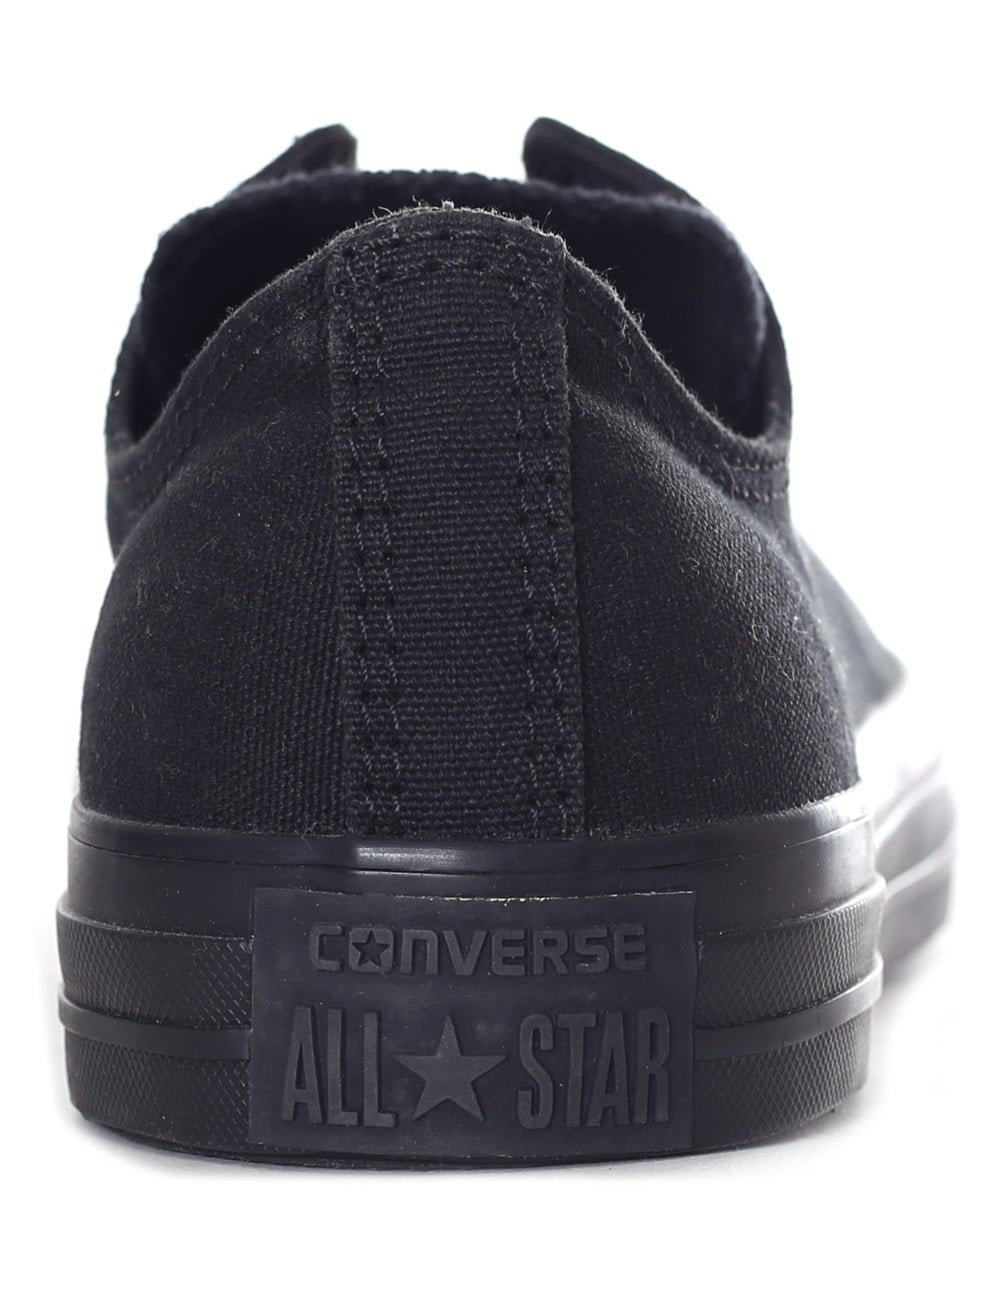 198ff35fd2a52f Converse Men s Chuck Taylor All Star Classic Sneaker